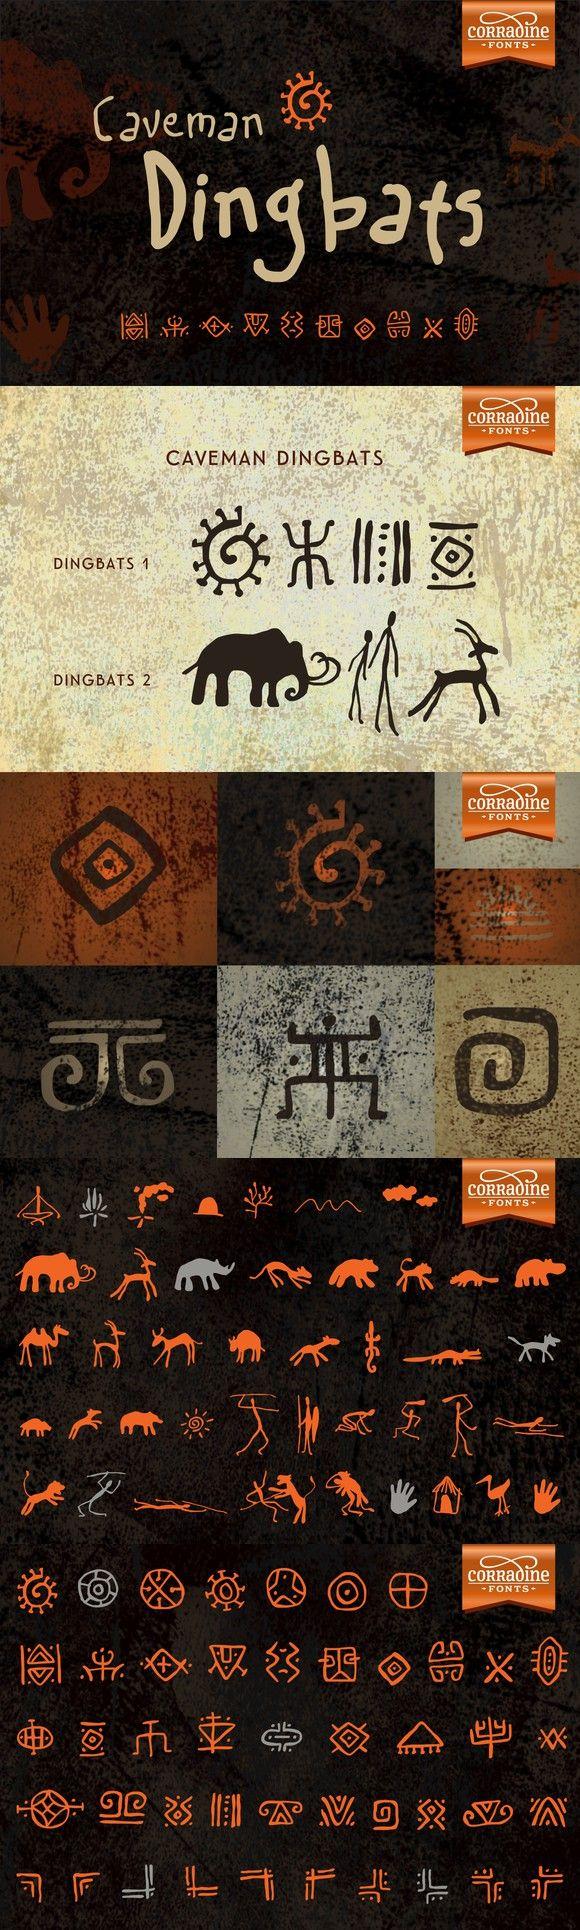 39 Best Symbol Fonts Images On Pinterest Fonts Icons And Script Fonts